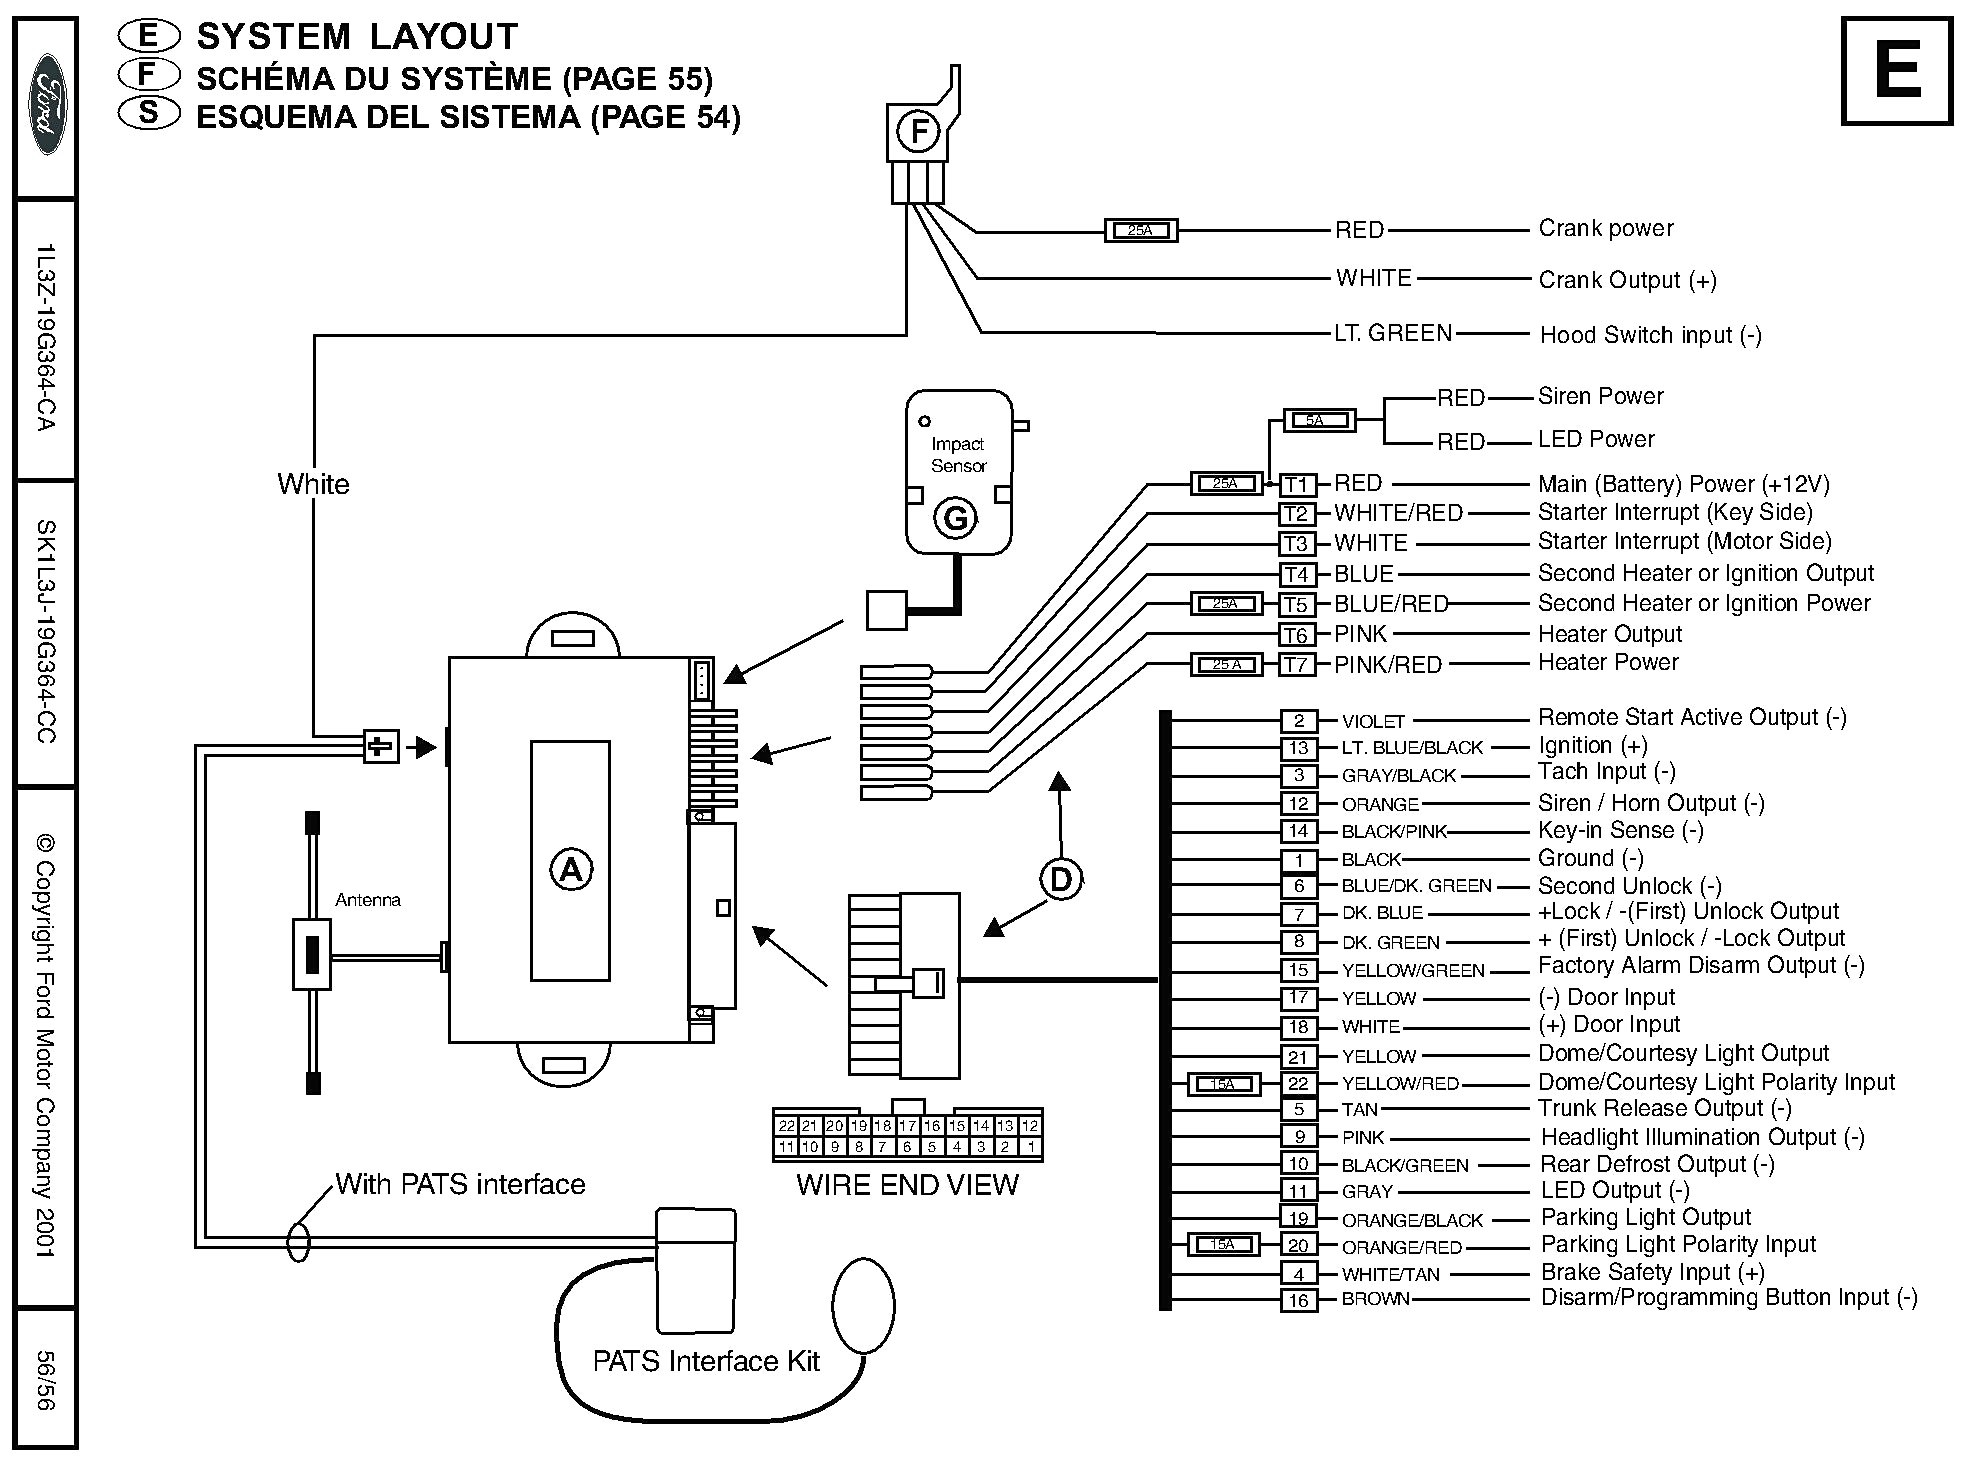 2003 Tacoma Alarm Wiring - Wiring Diagram Data - Car Alarm Wiring Diagram